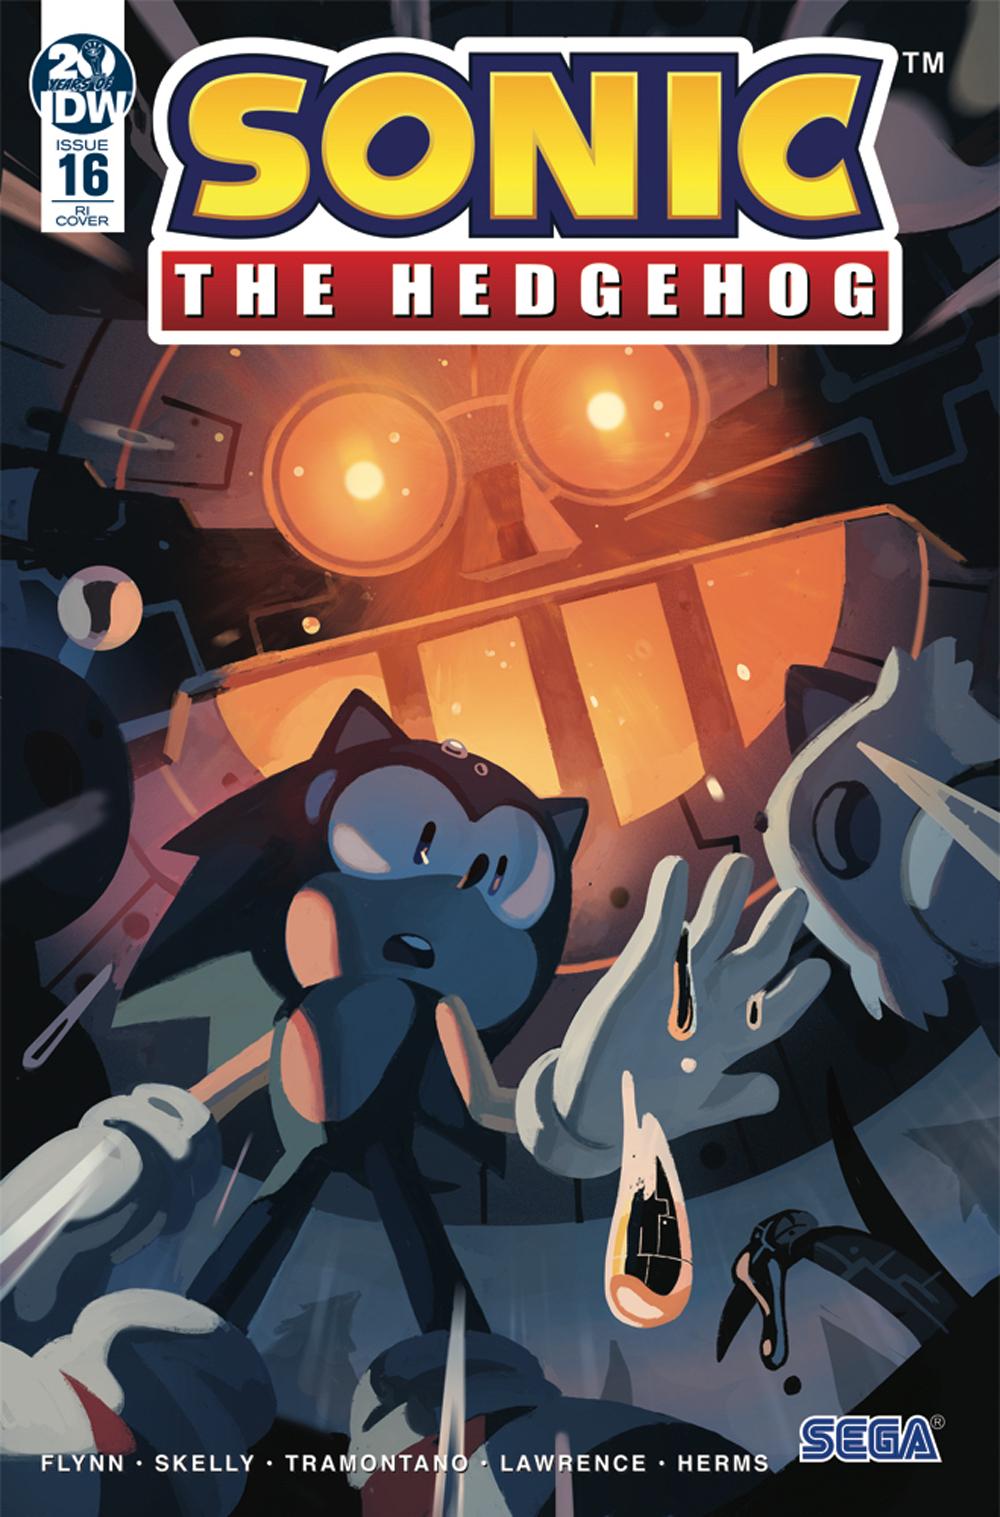 Idw Sonic The Hedgehog Issue 16 Sonic News Network Fandom